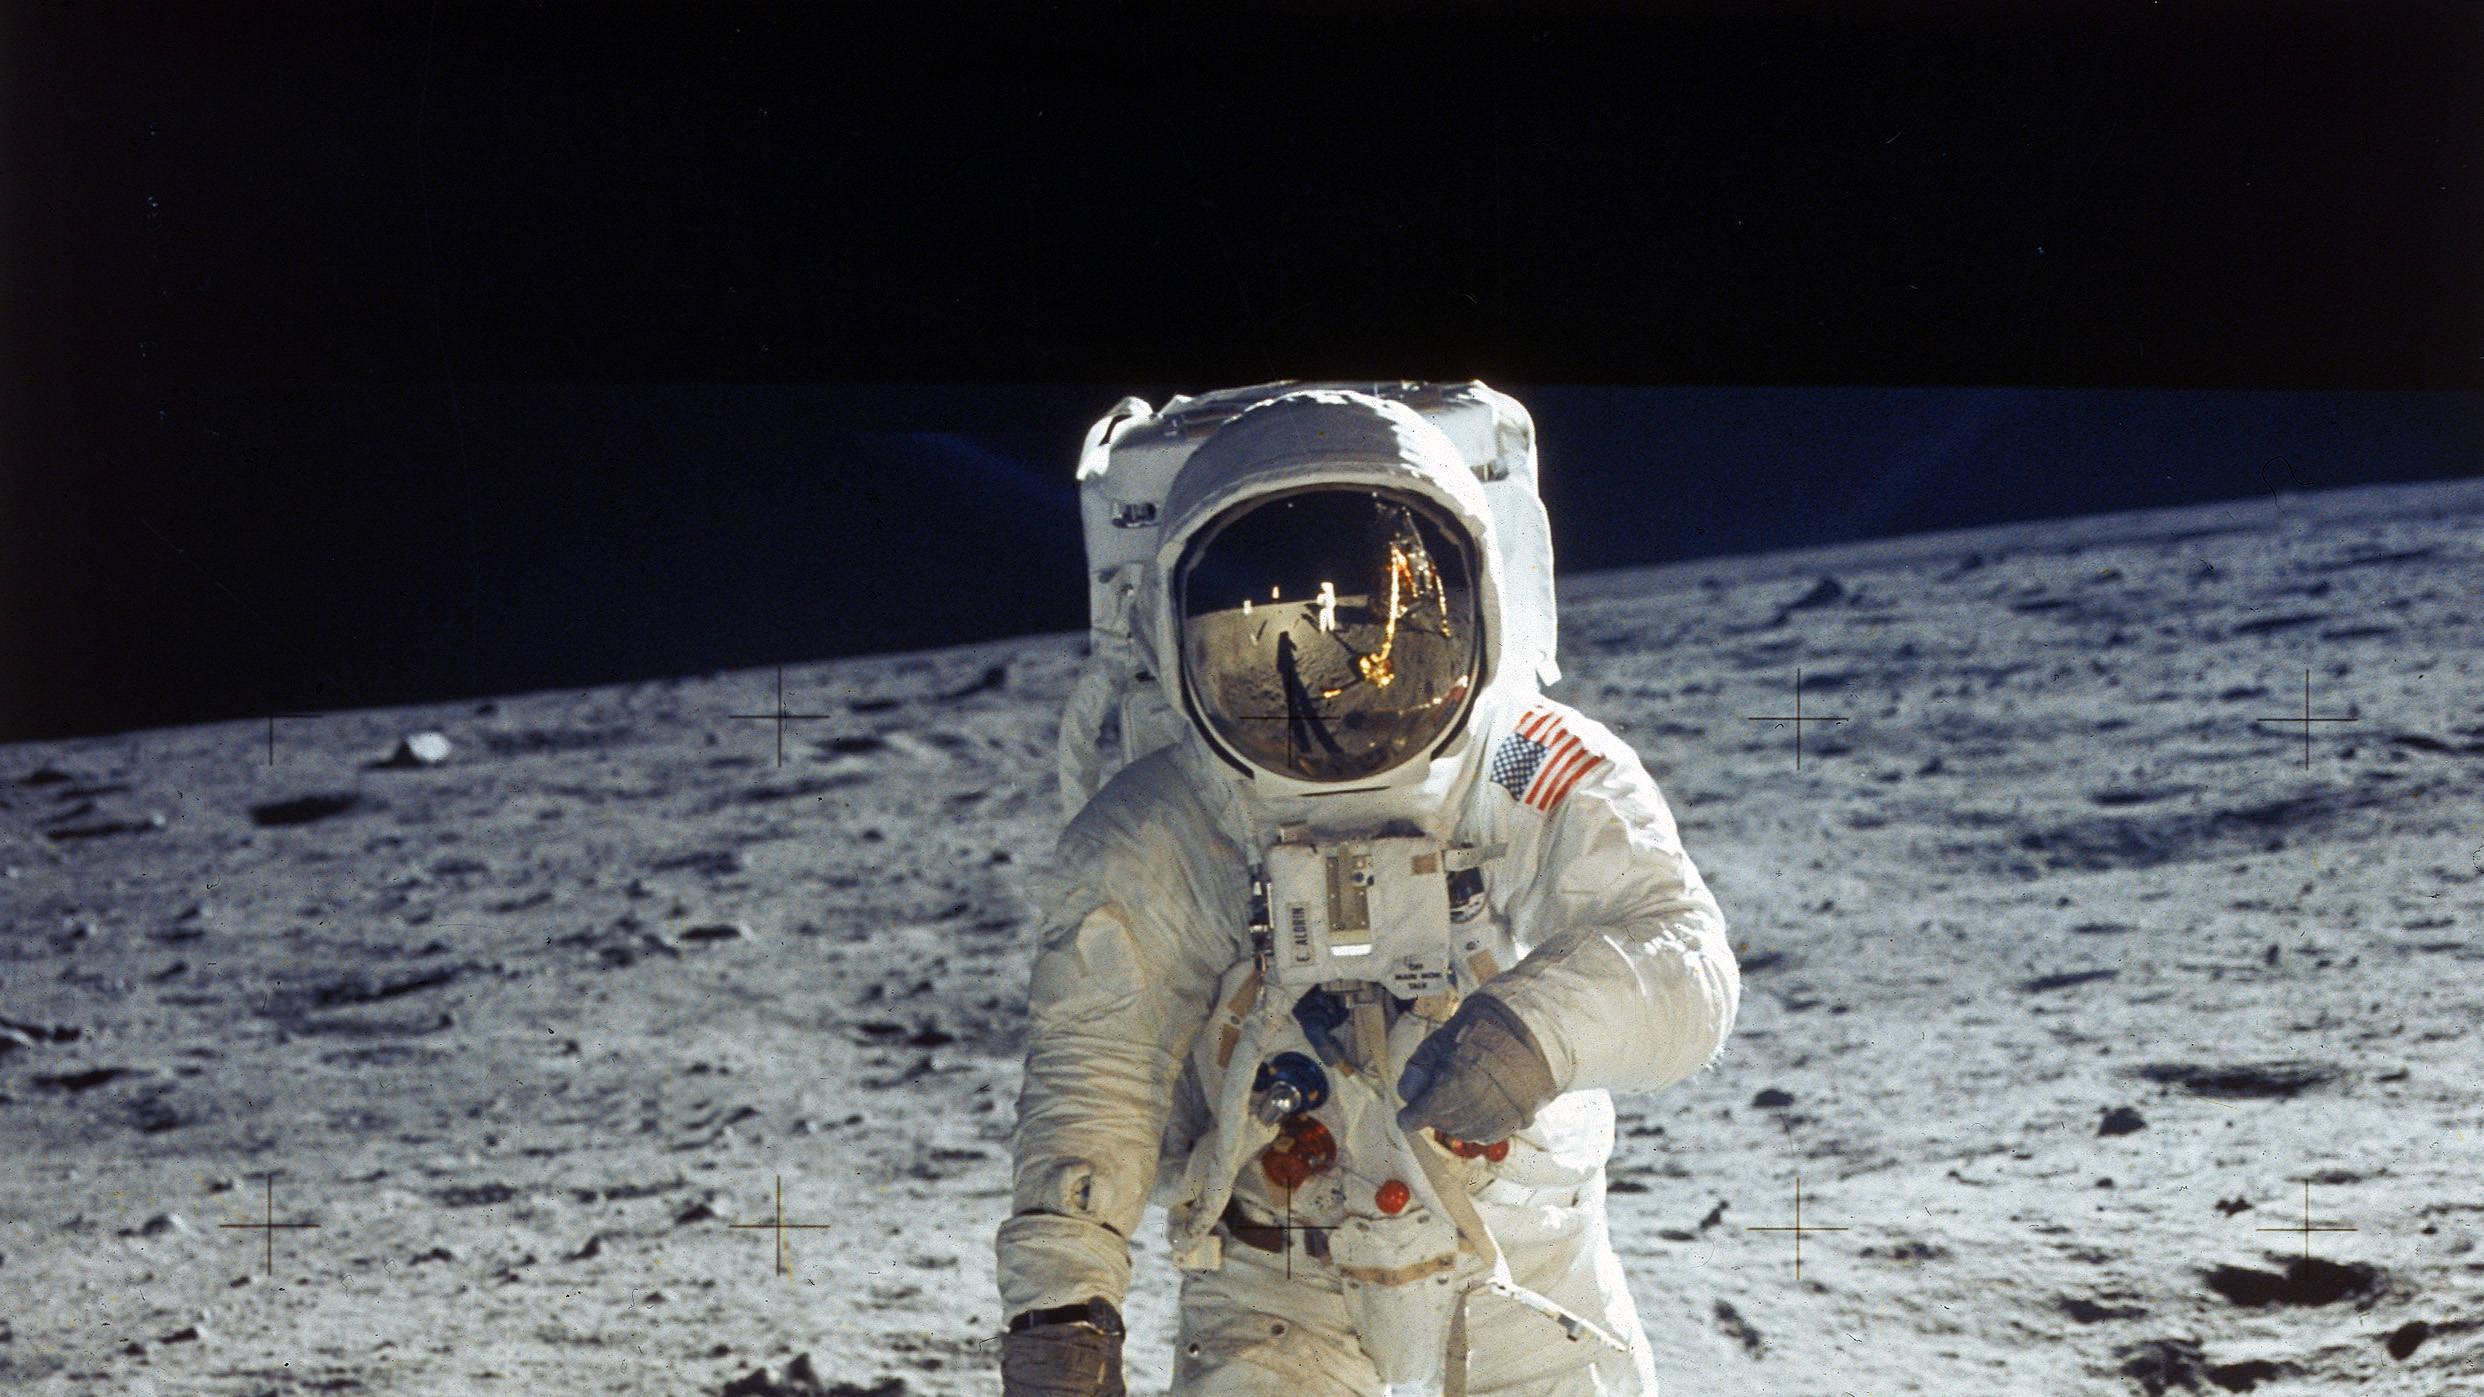 Moon Landing Anniversary: 50 Years Since Apollo 11 Mission